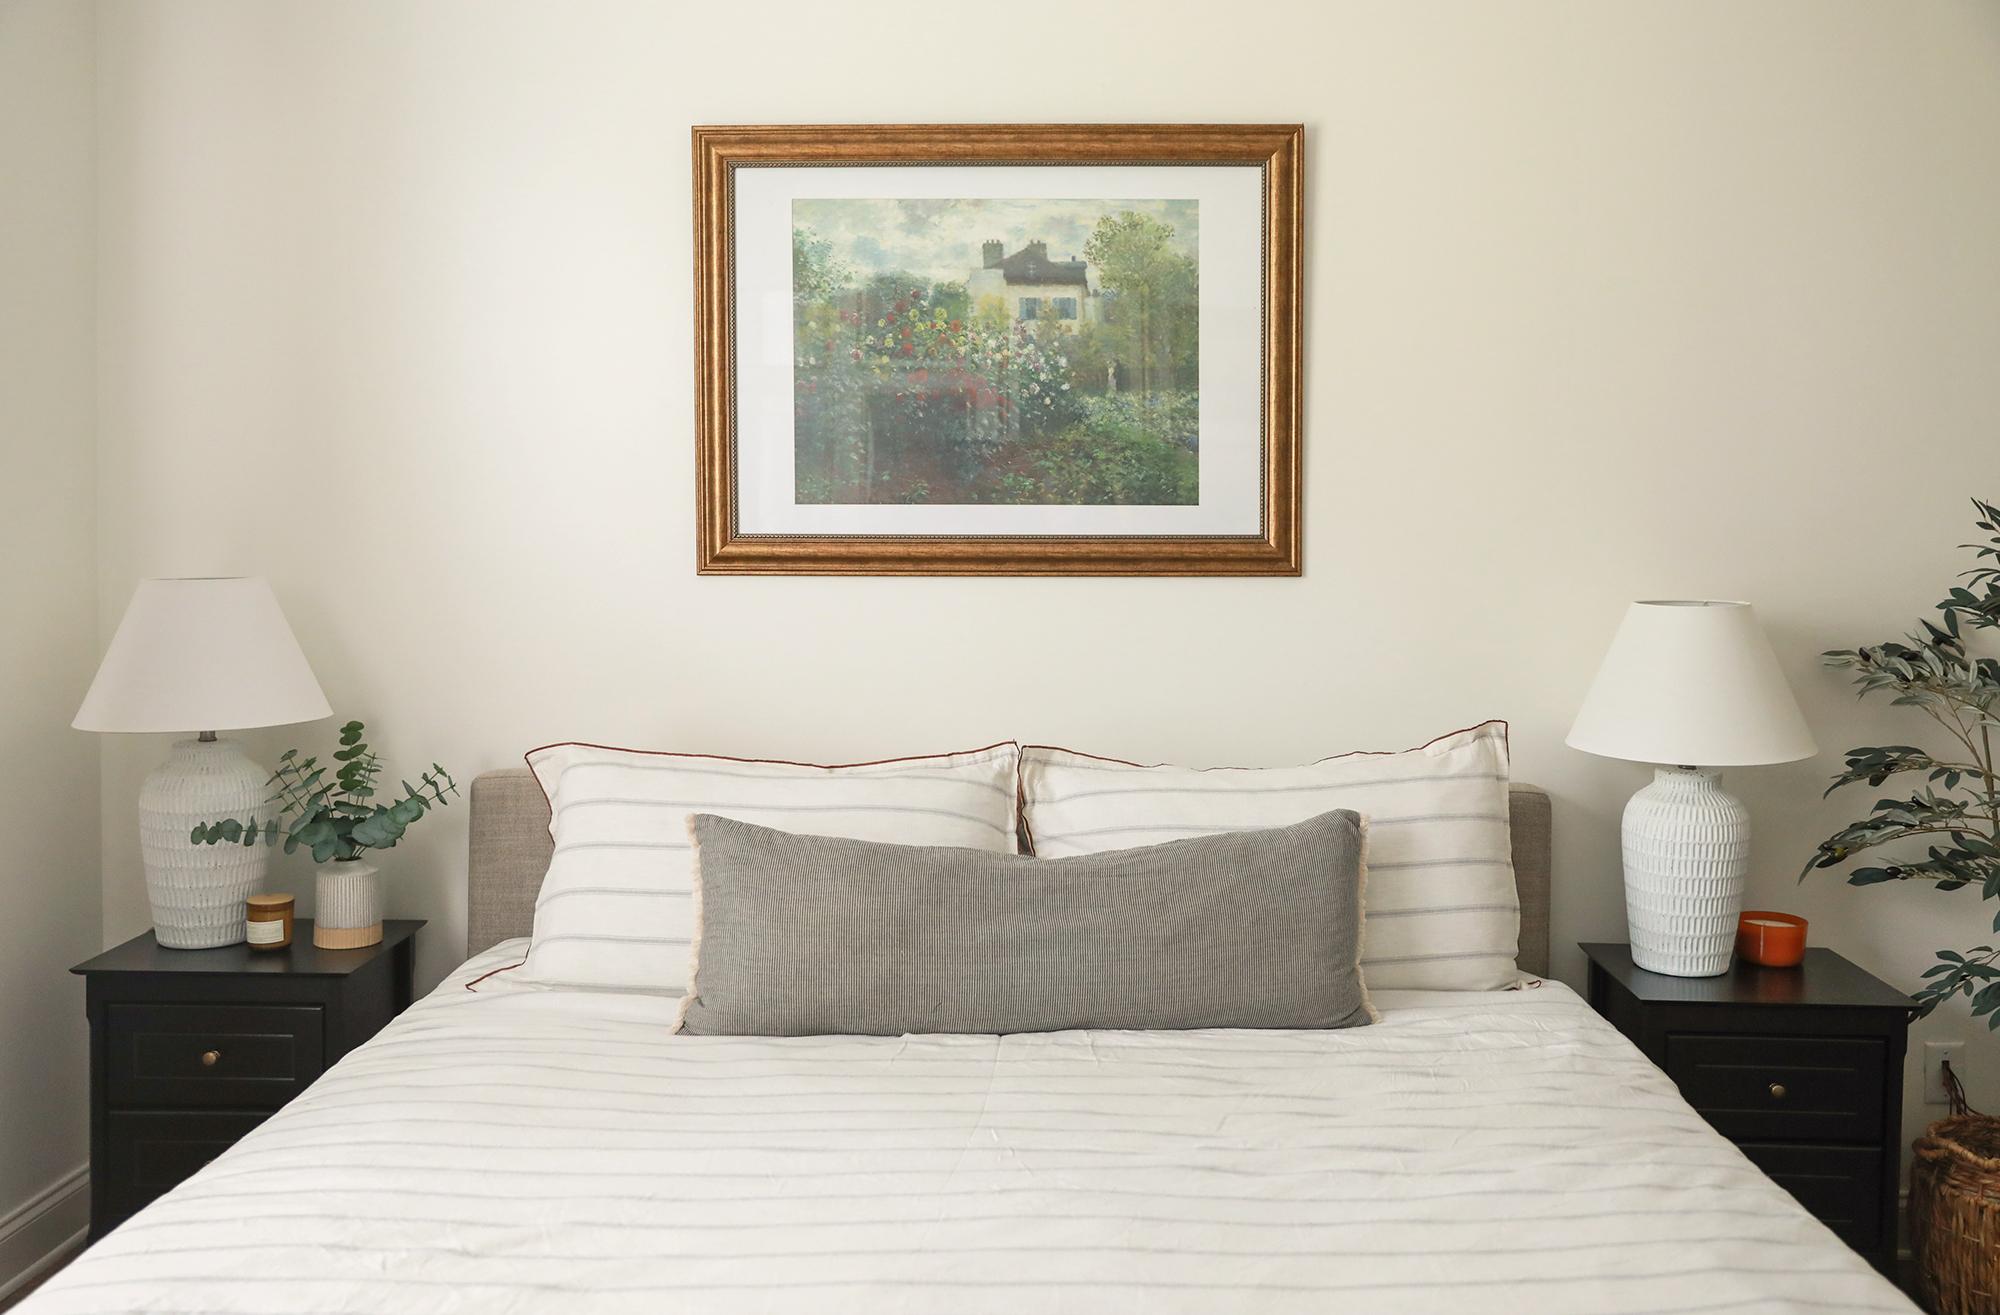 king size bed - striped duvet